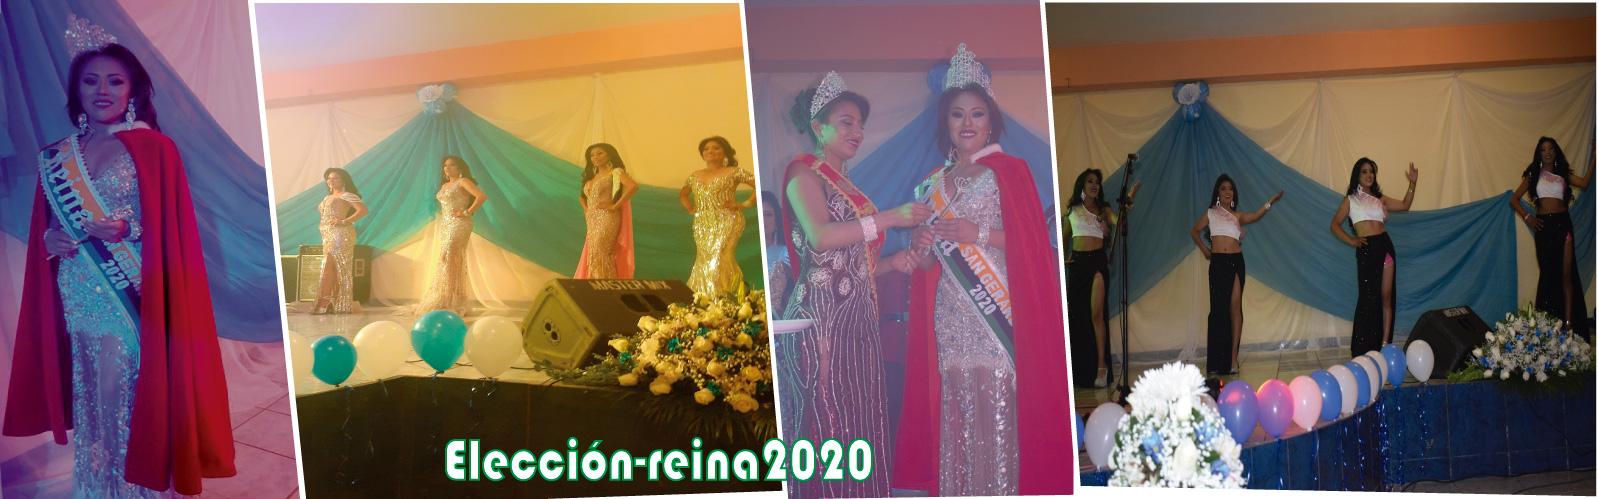 eleccion-reina2020.jpg